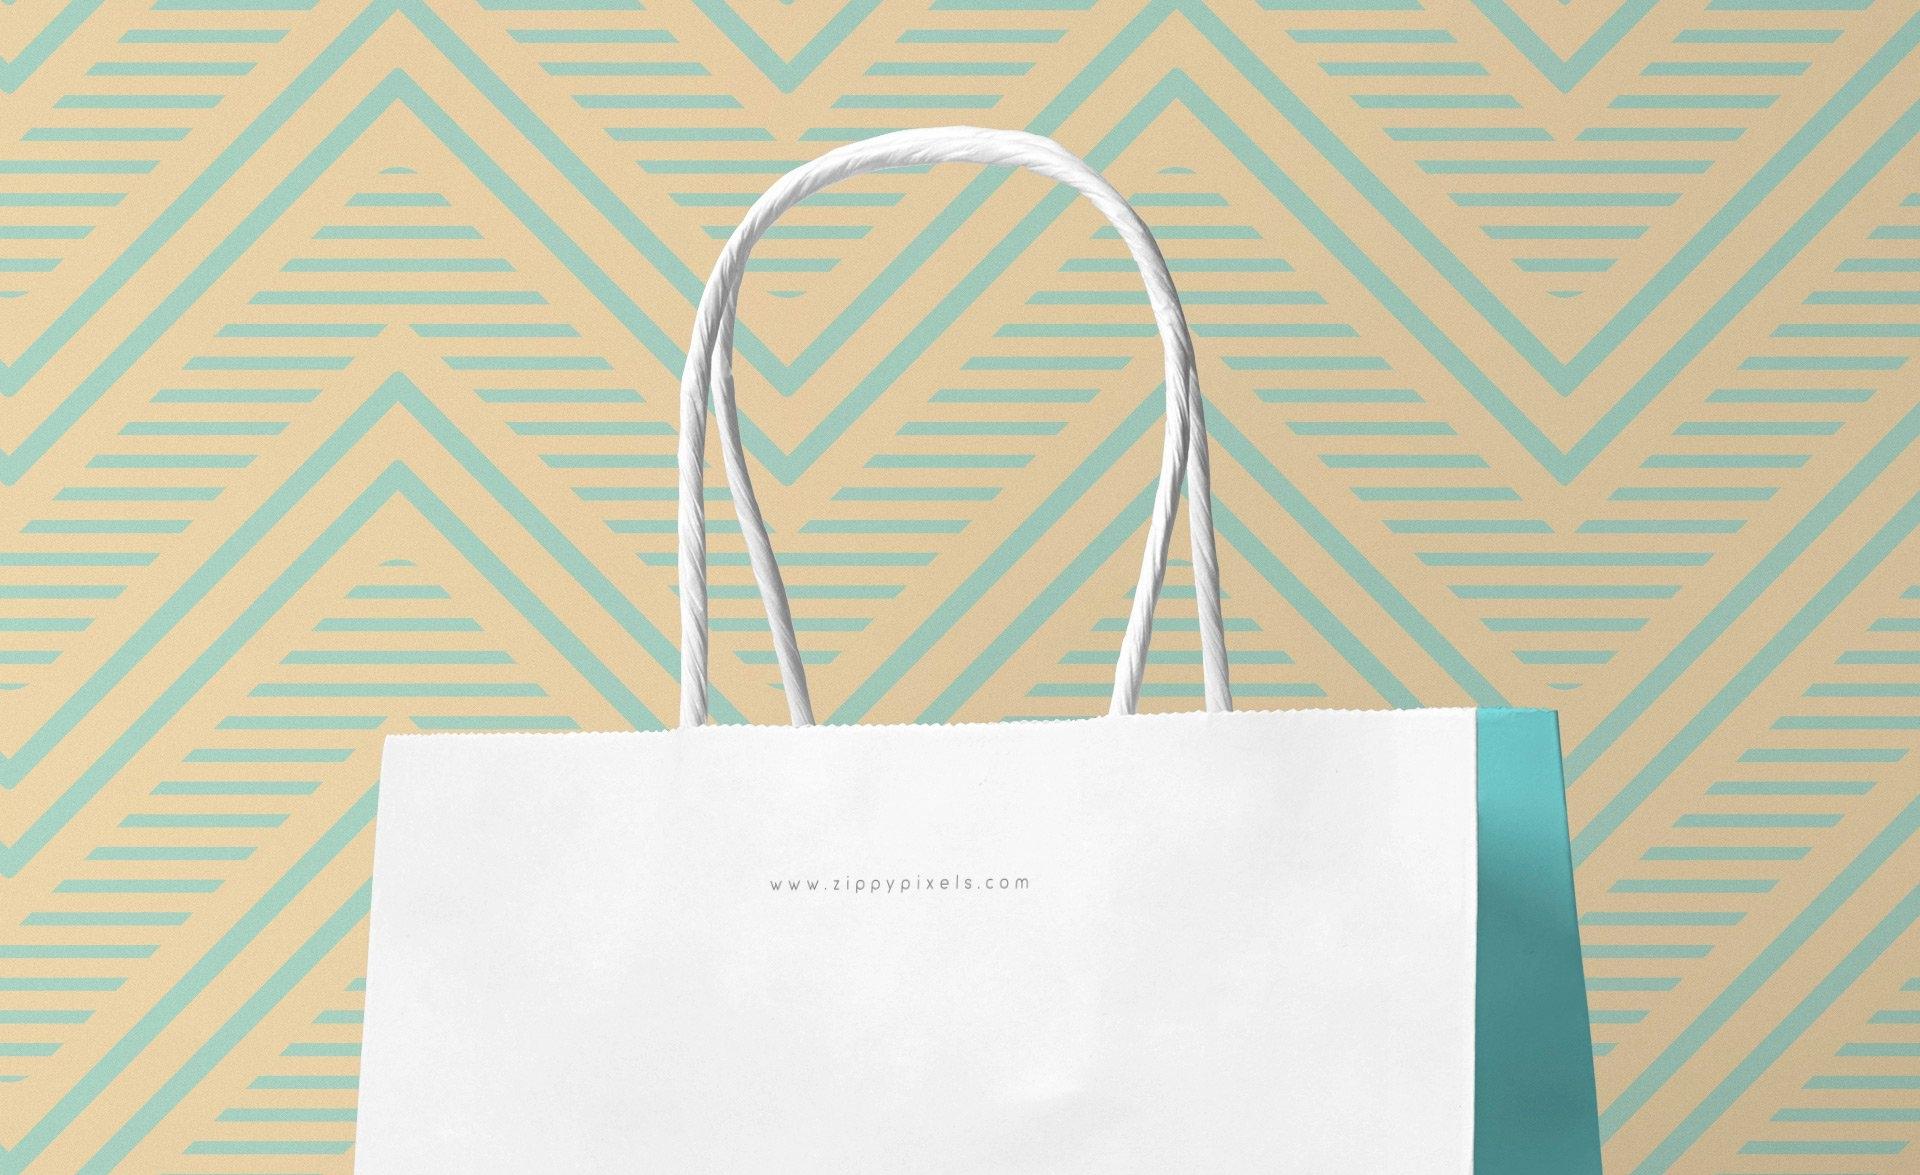 牛皮纸手提袋场景样机  素材305-gift-bag-small-mockup-free